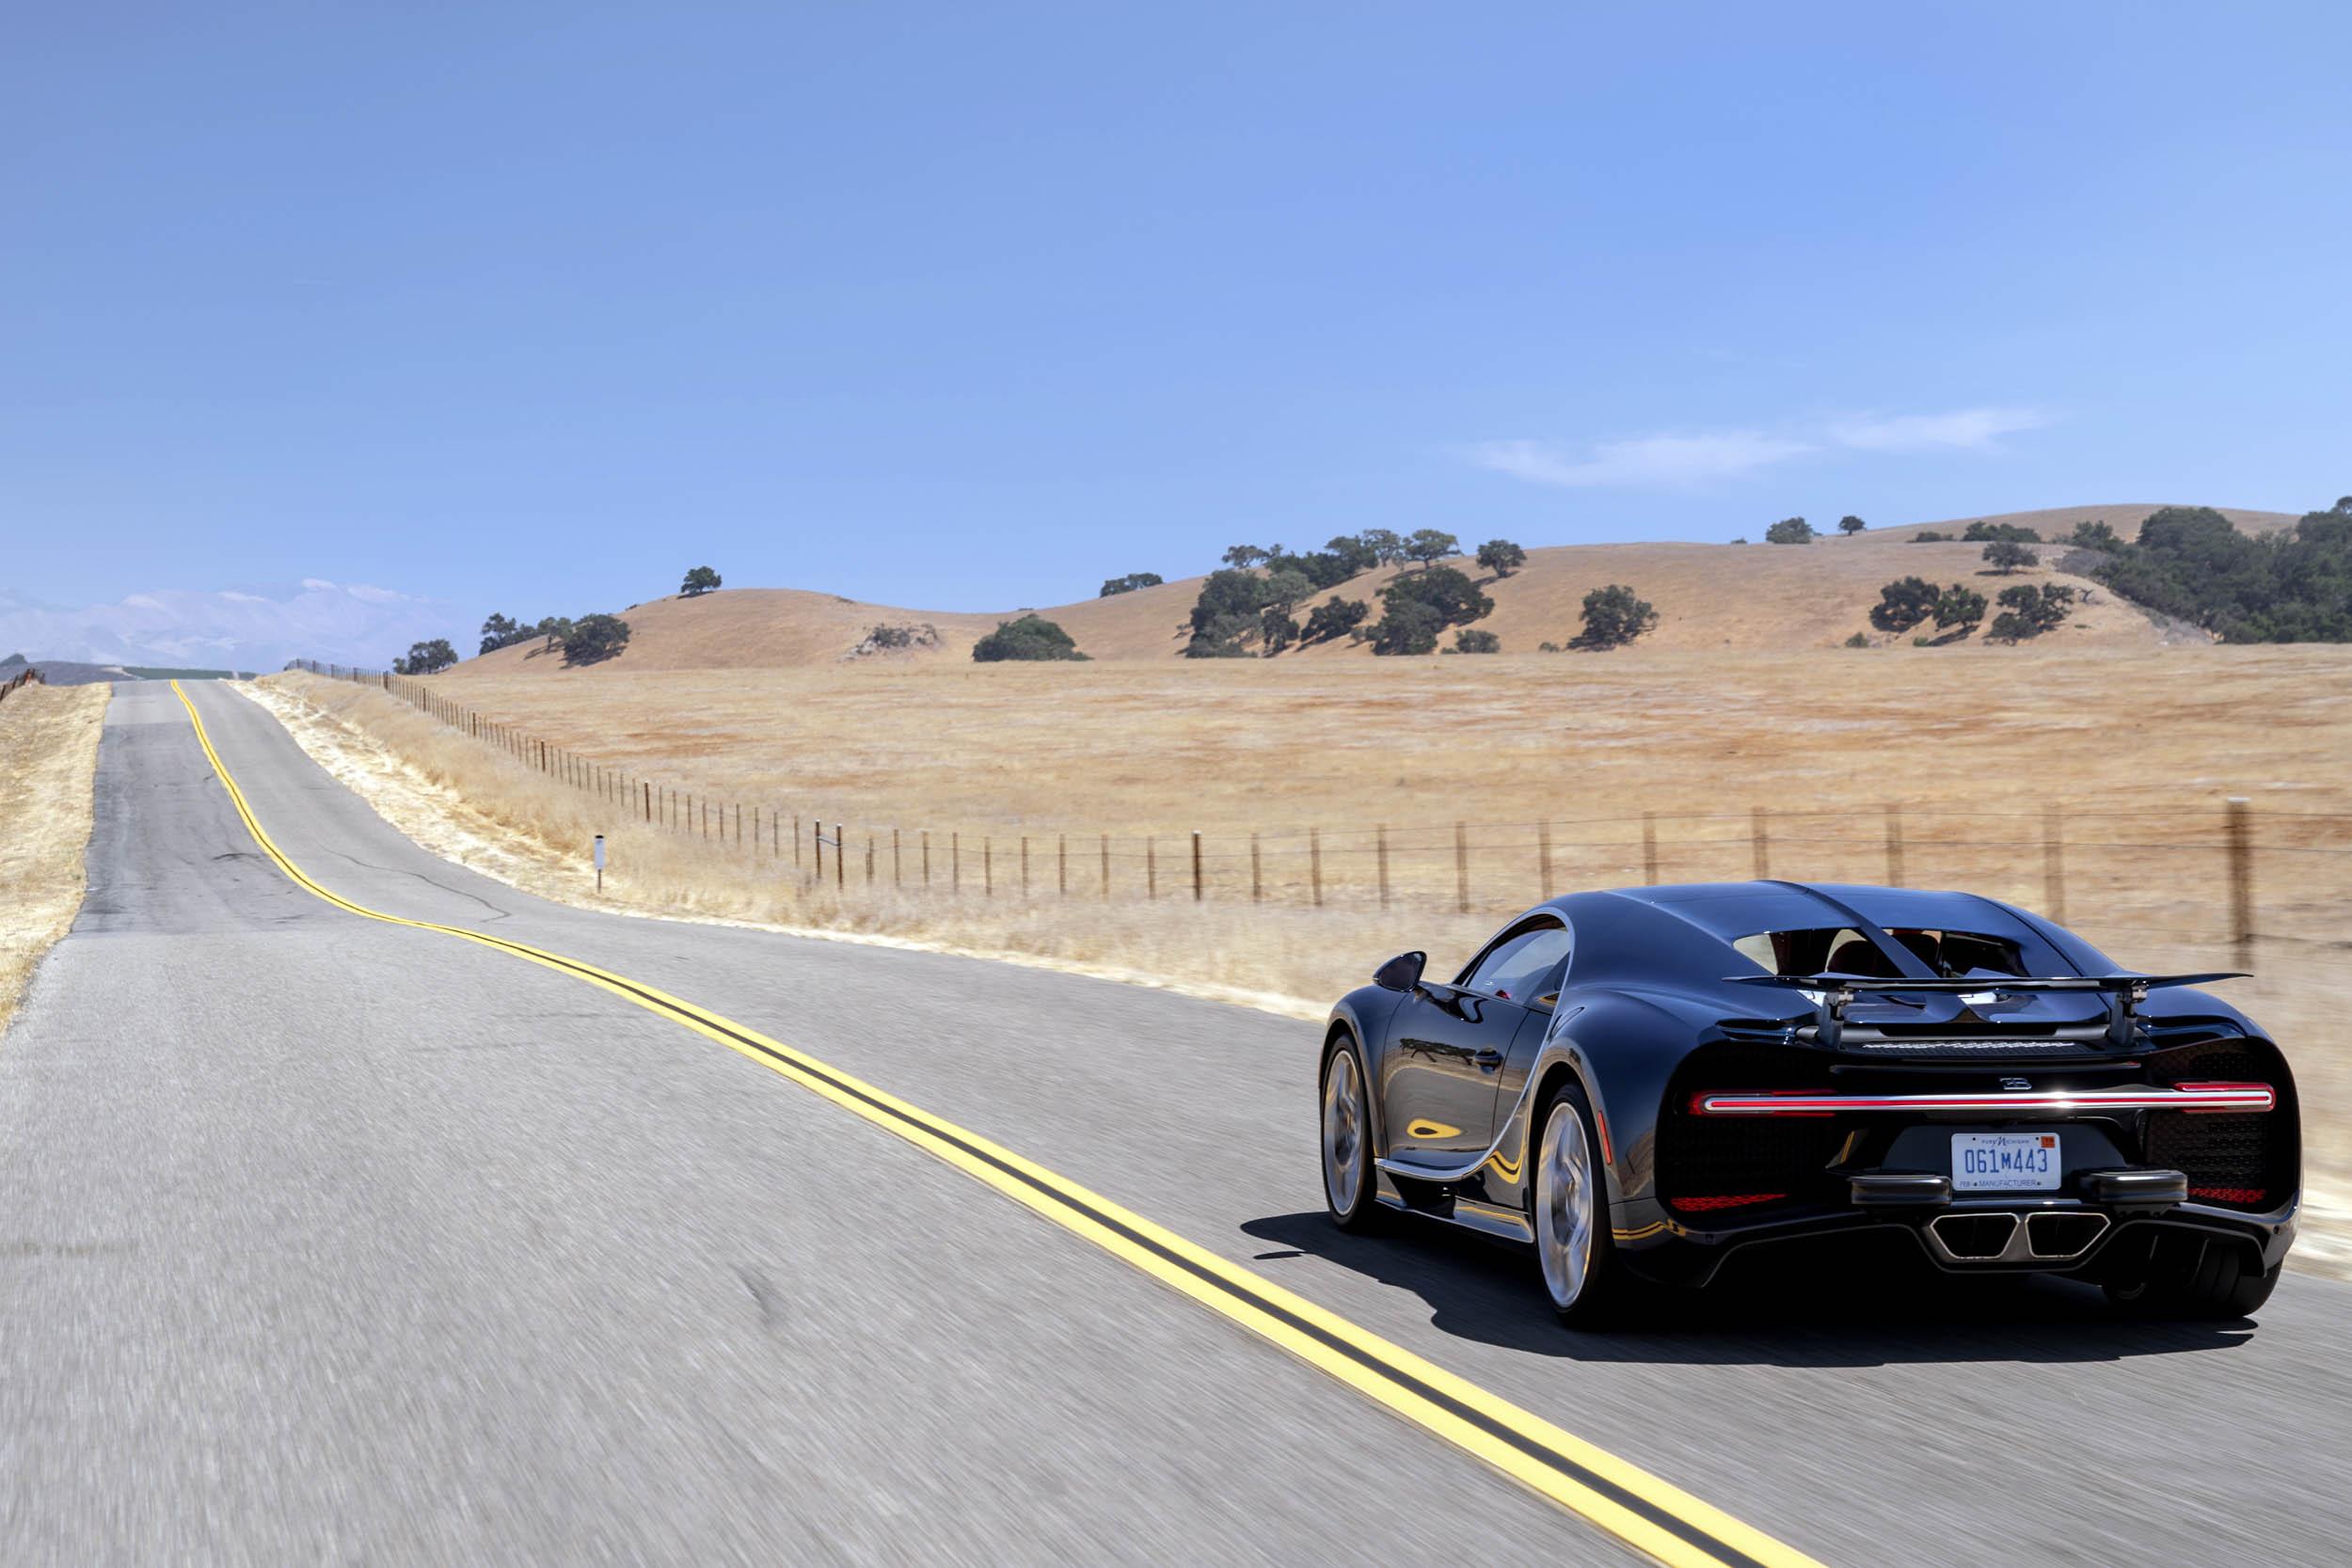 2018 Bugatti Chiron rear